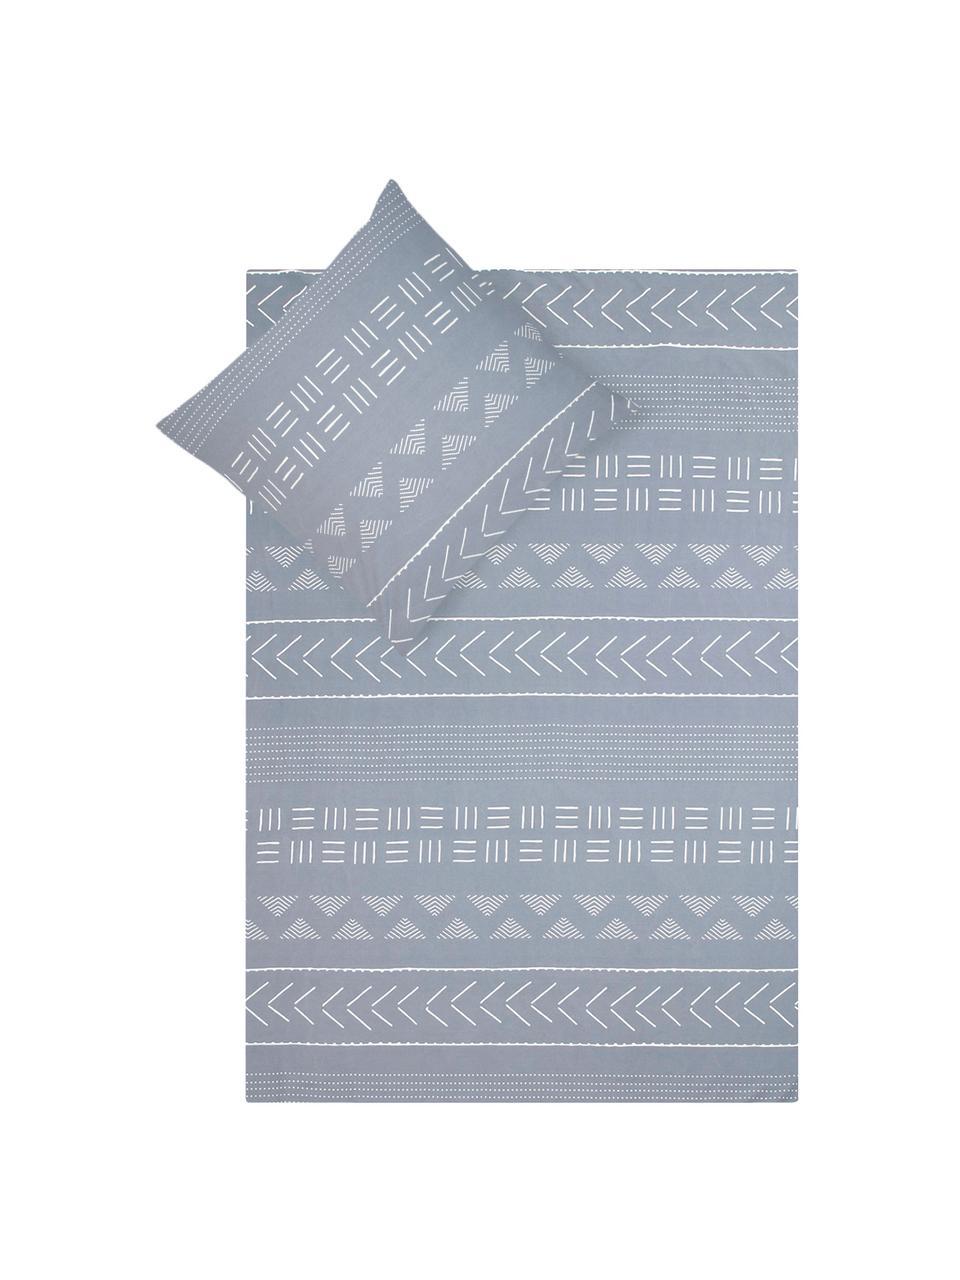 Gewaschene Baumwoll-Bettwäsche Kohana im Boho Style, Webart: Perkal Fadendichte 180 TC, Grau, Ecru, 240 x 220 cm + 2 Kissen 80 x 80 cm